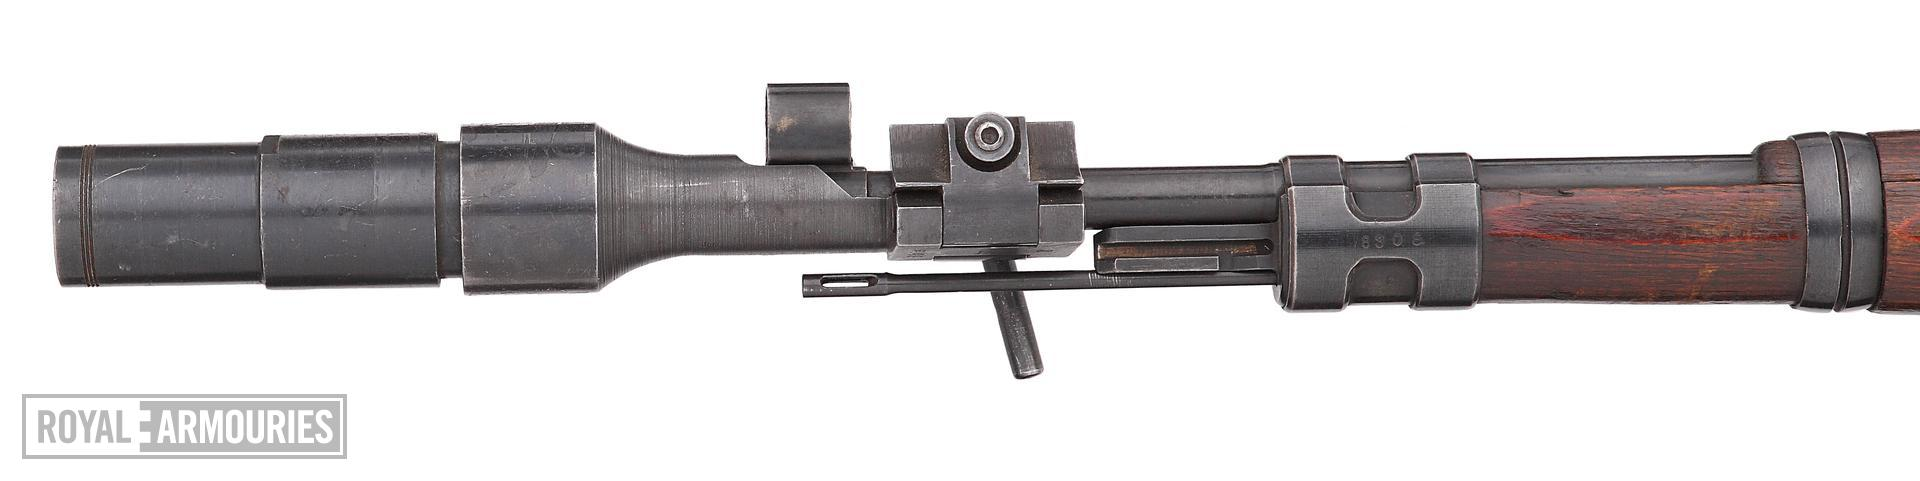 Centrefire bolt-action rifle - Mauser Kar 98k